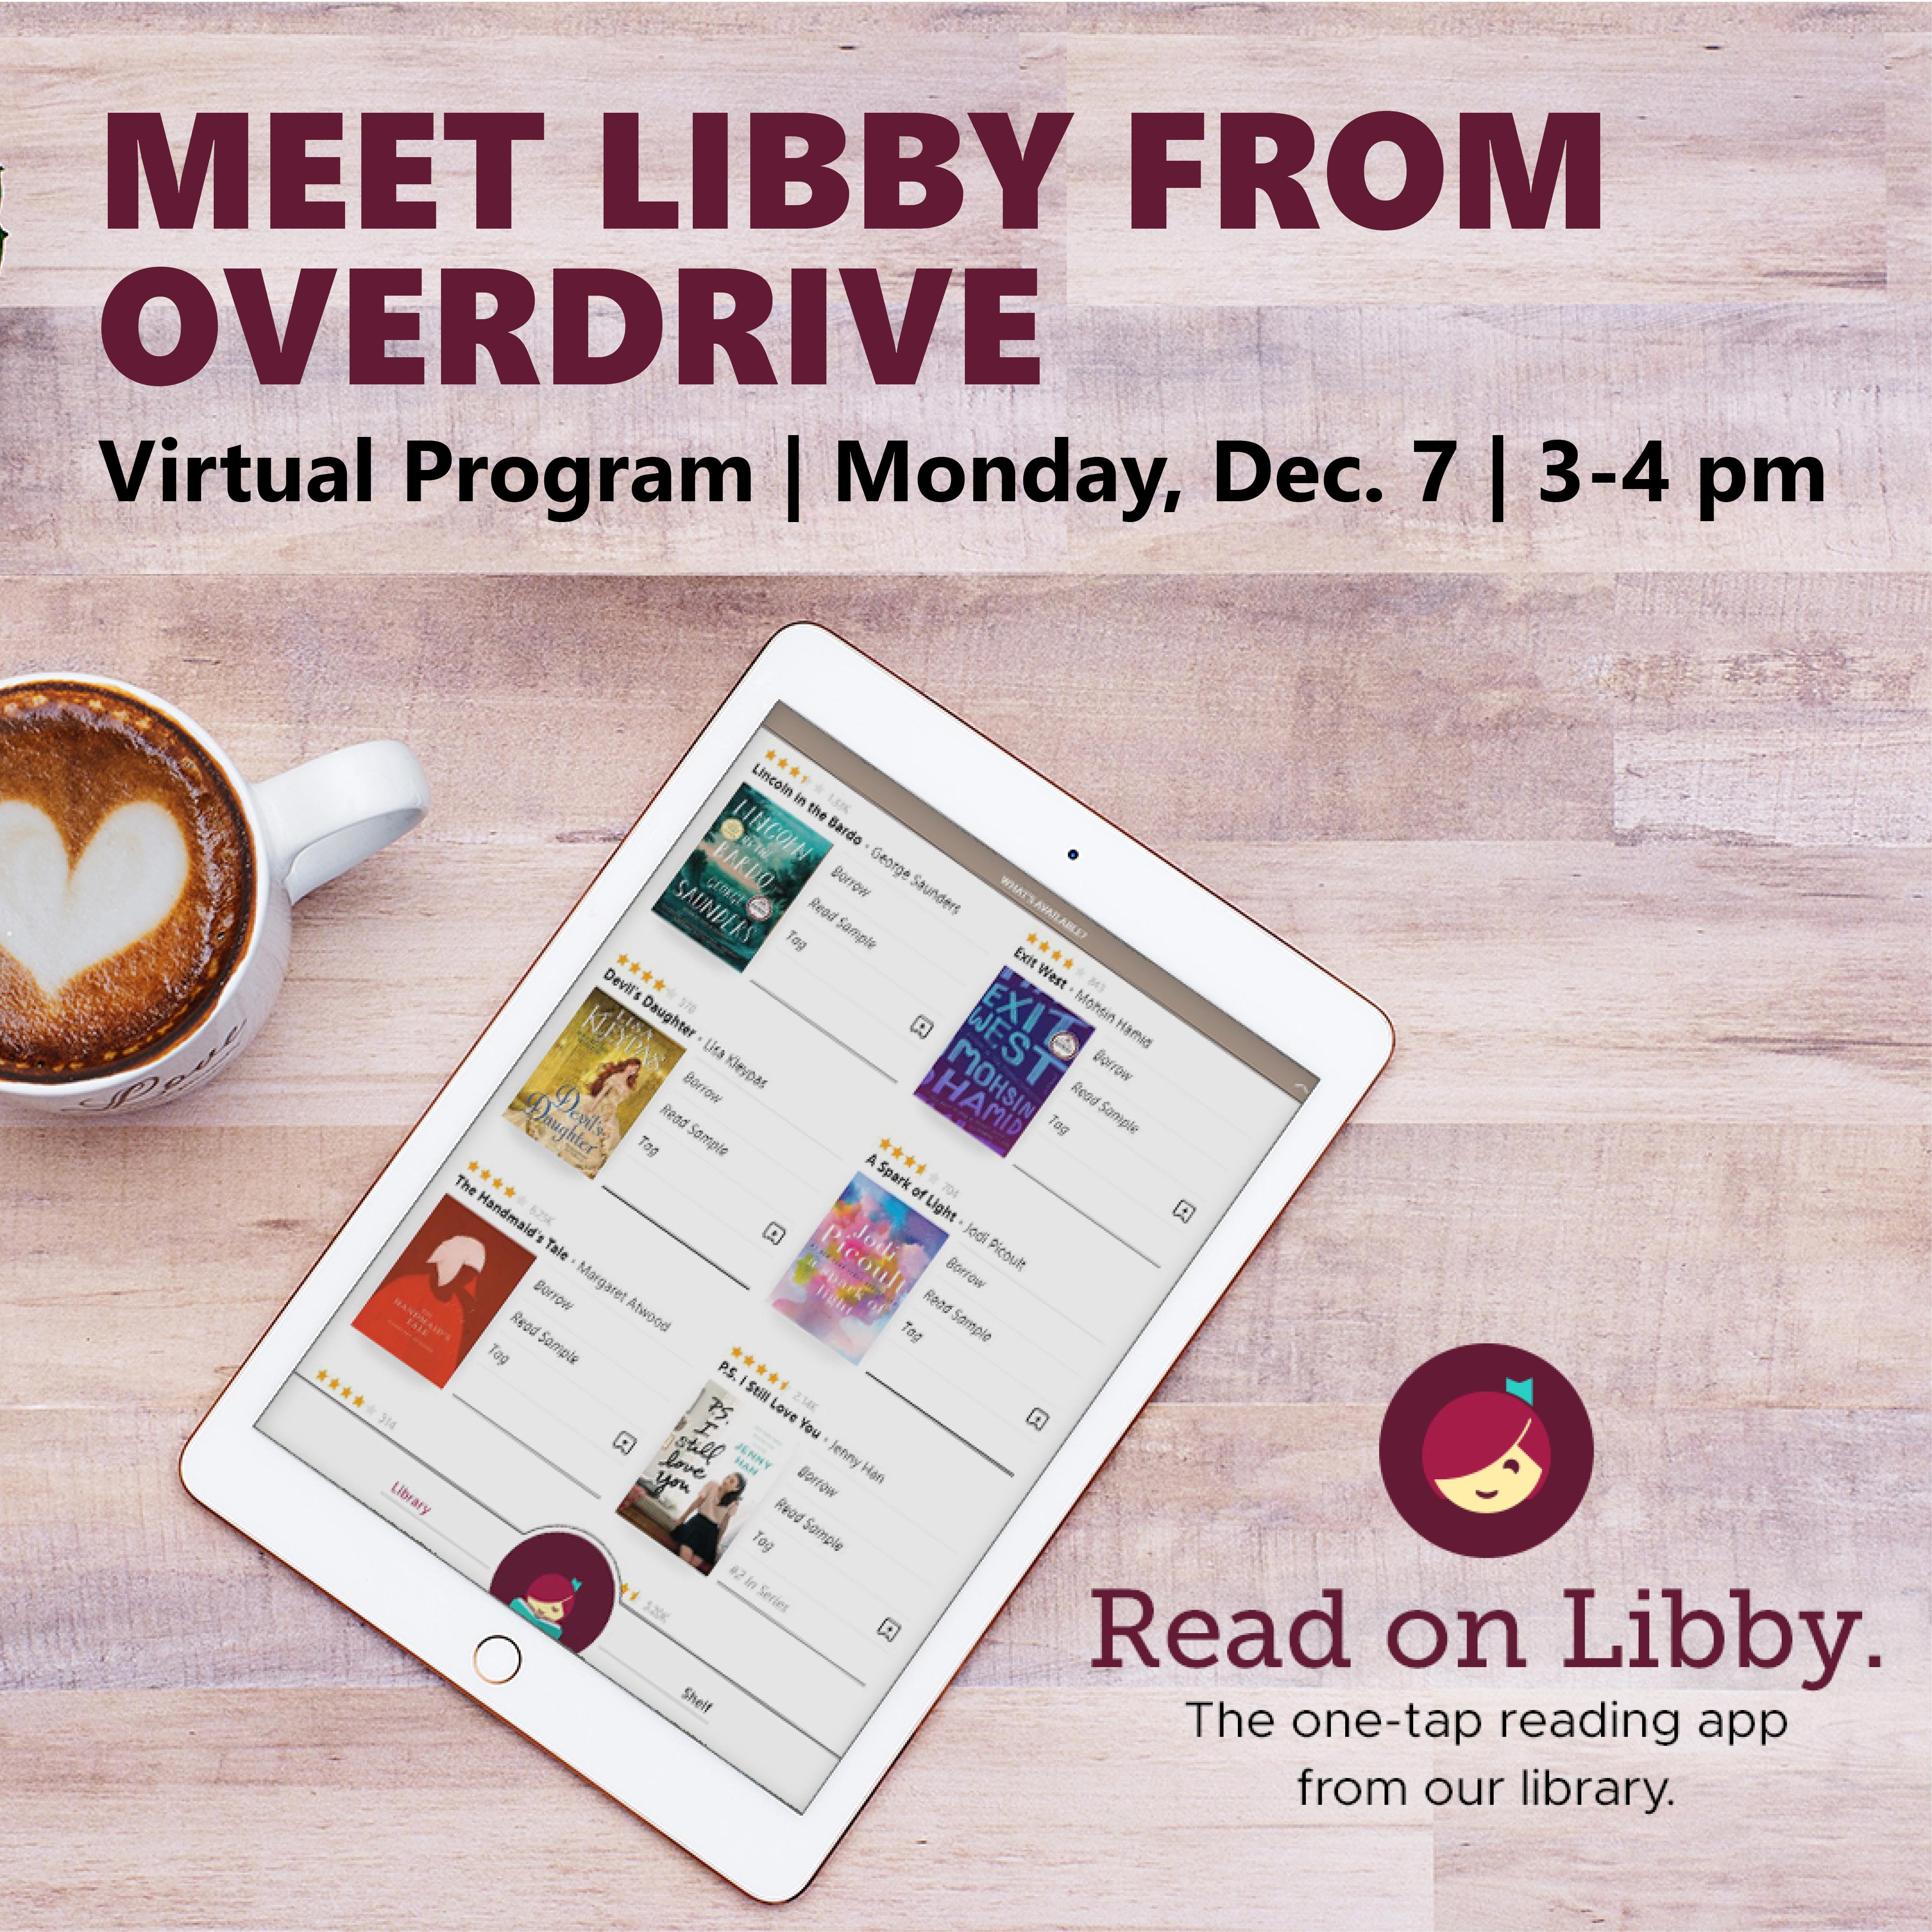 Meet Libby from OverDrive - Online Program